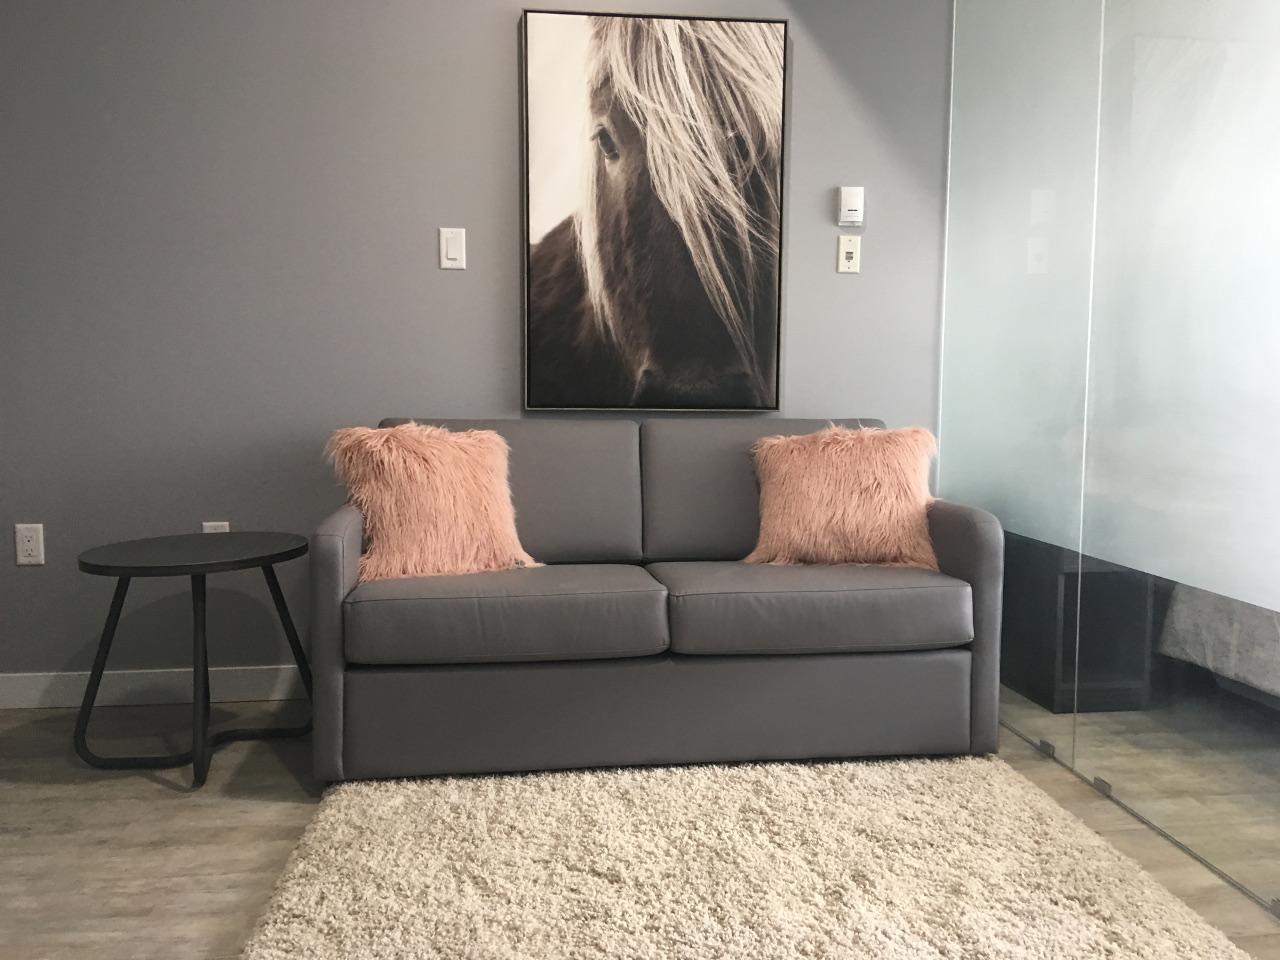 https://metro1827.ca/wp-content/uploads/2018/04/Couch1.jpg